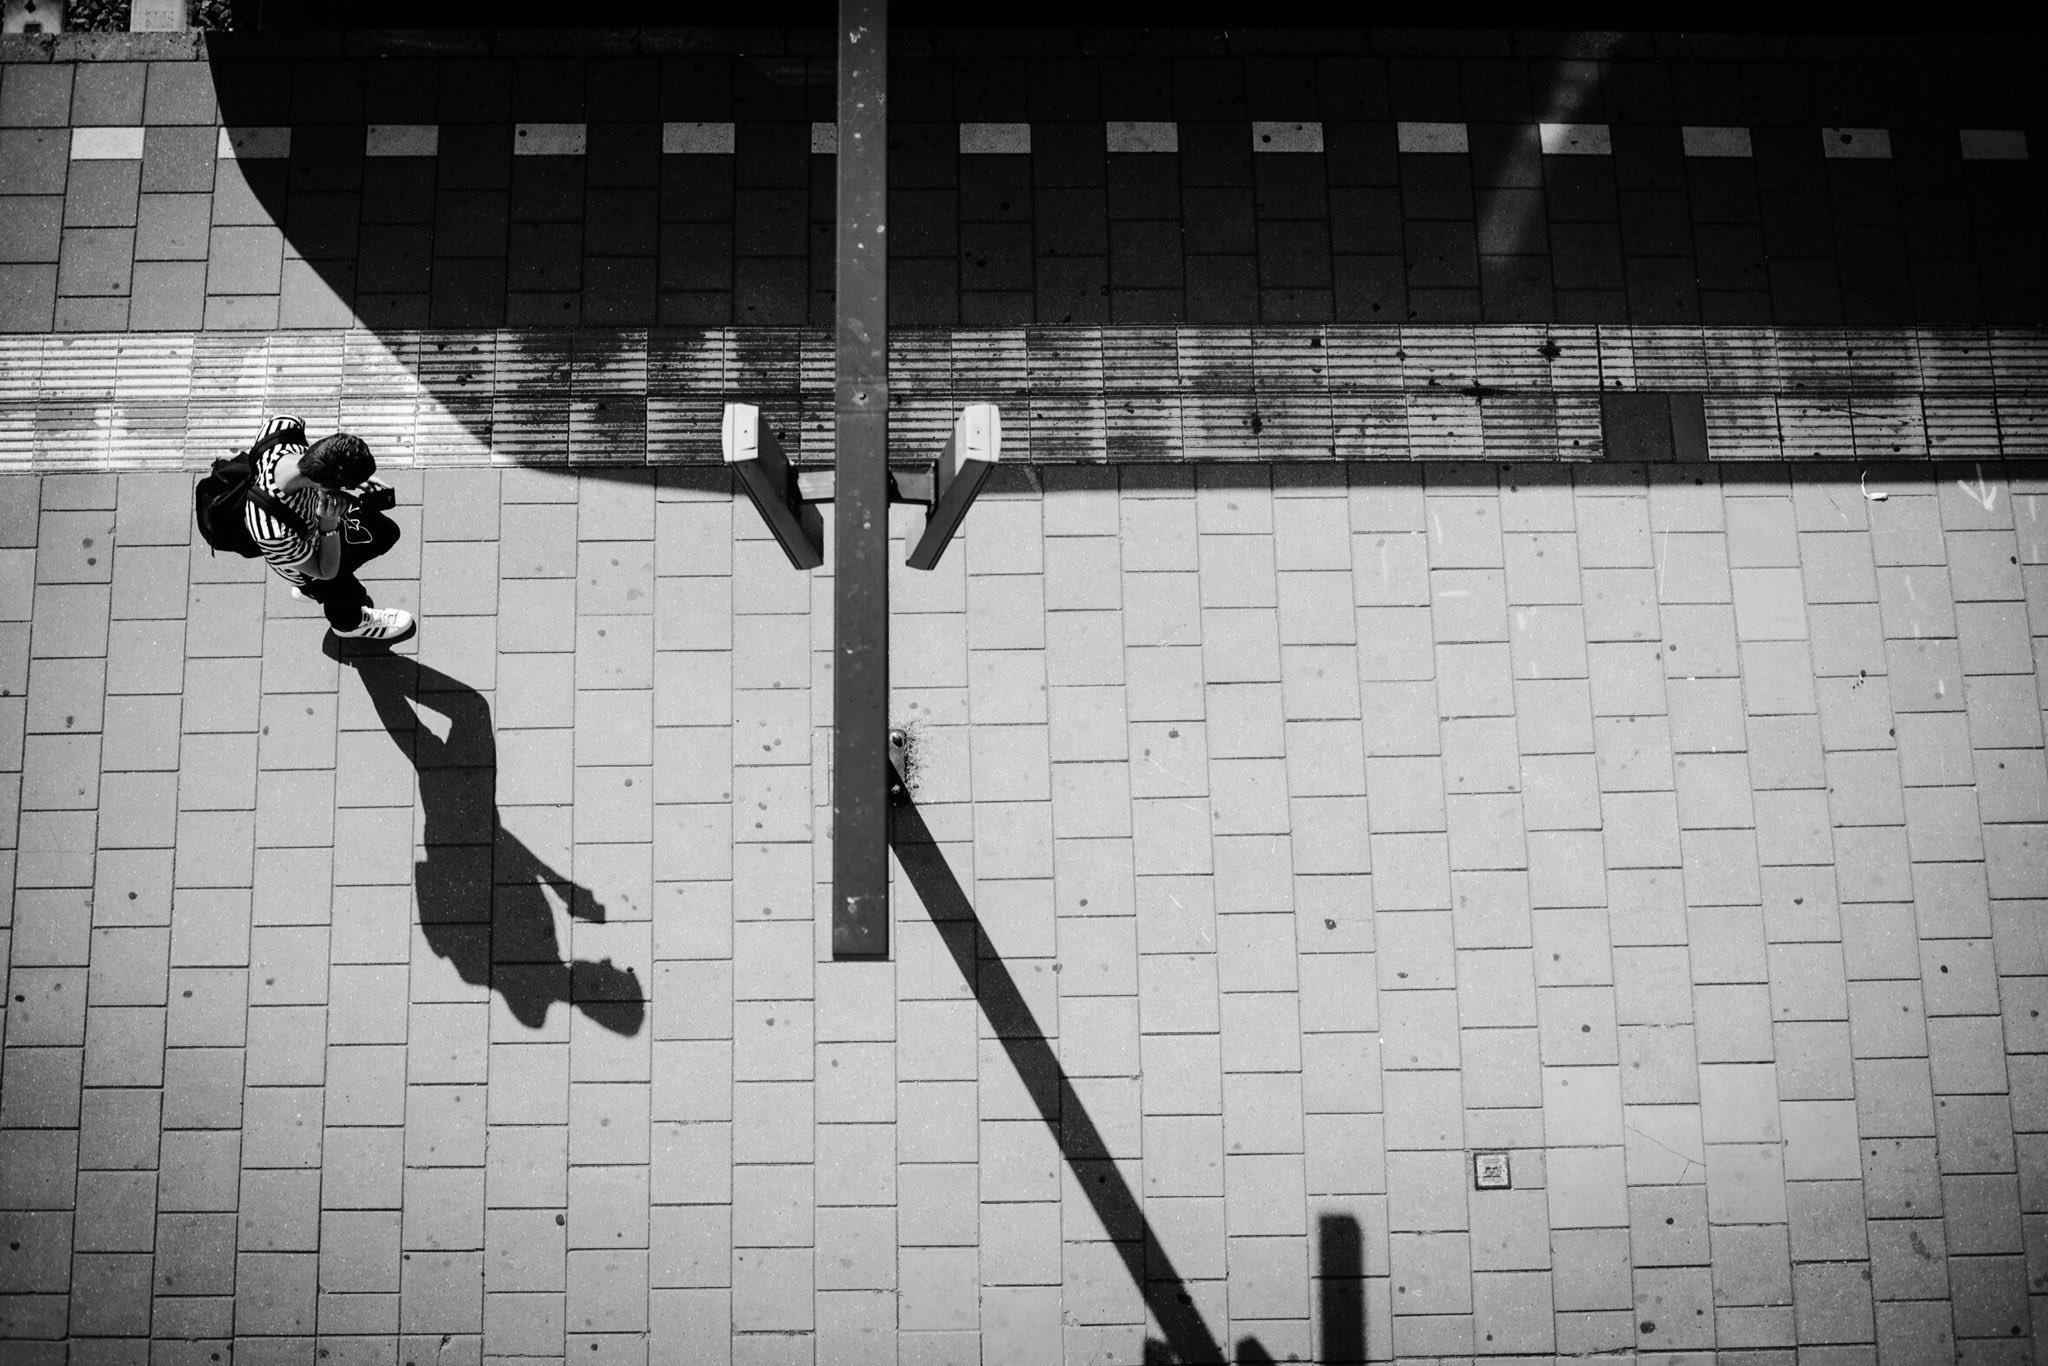 street_photography_6.jpg